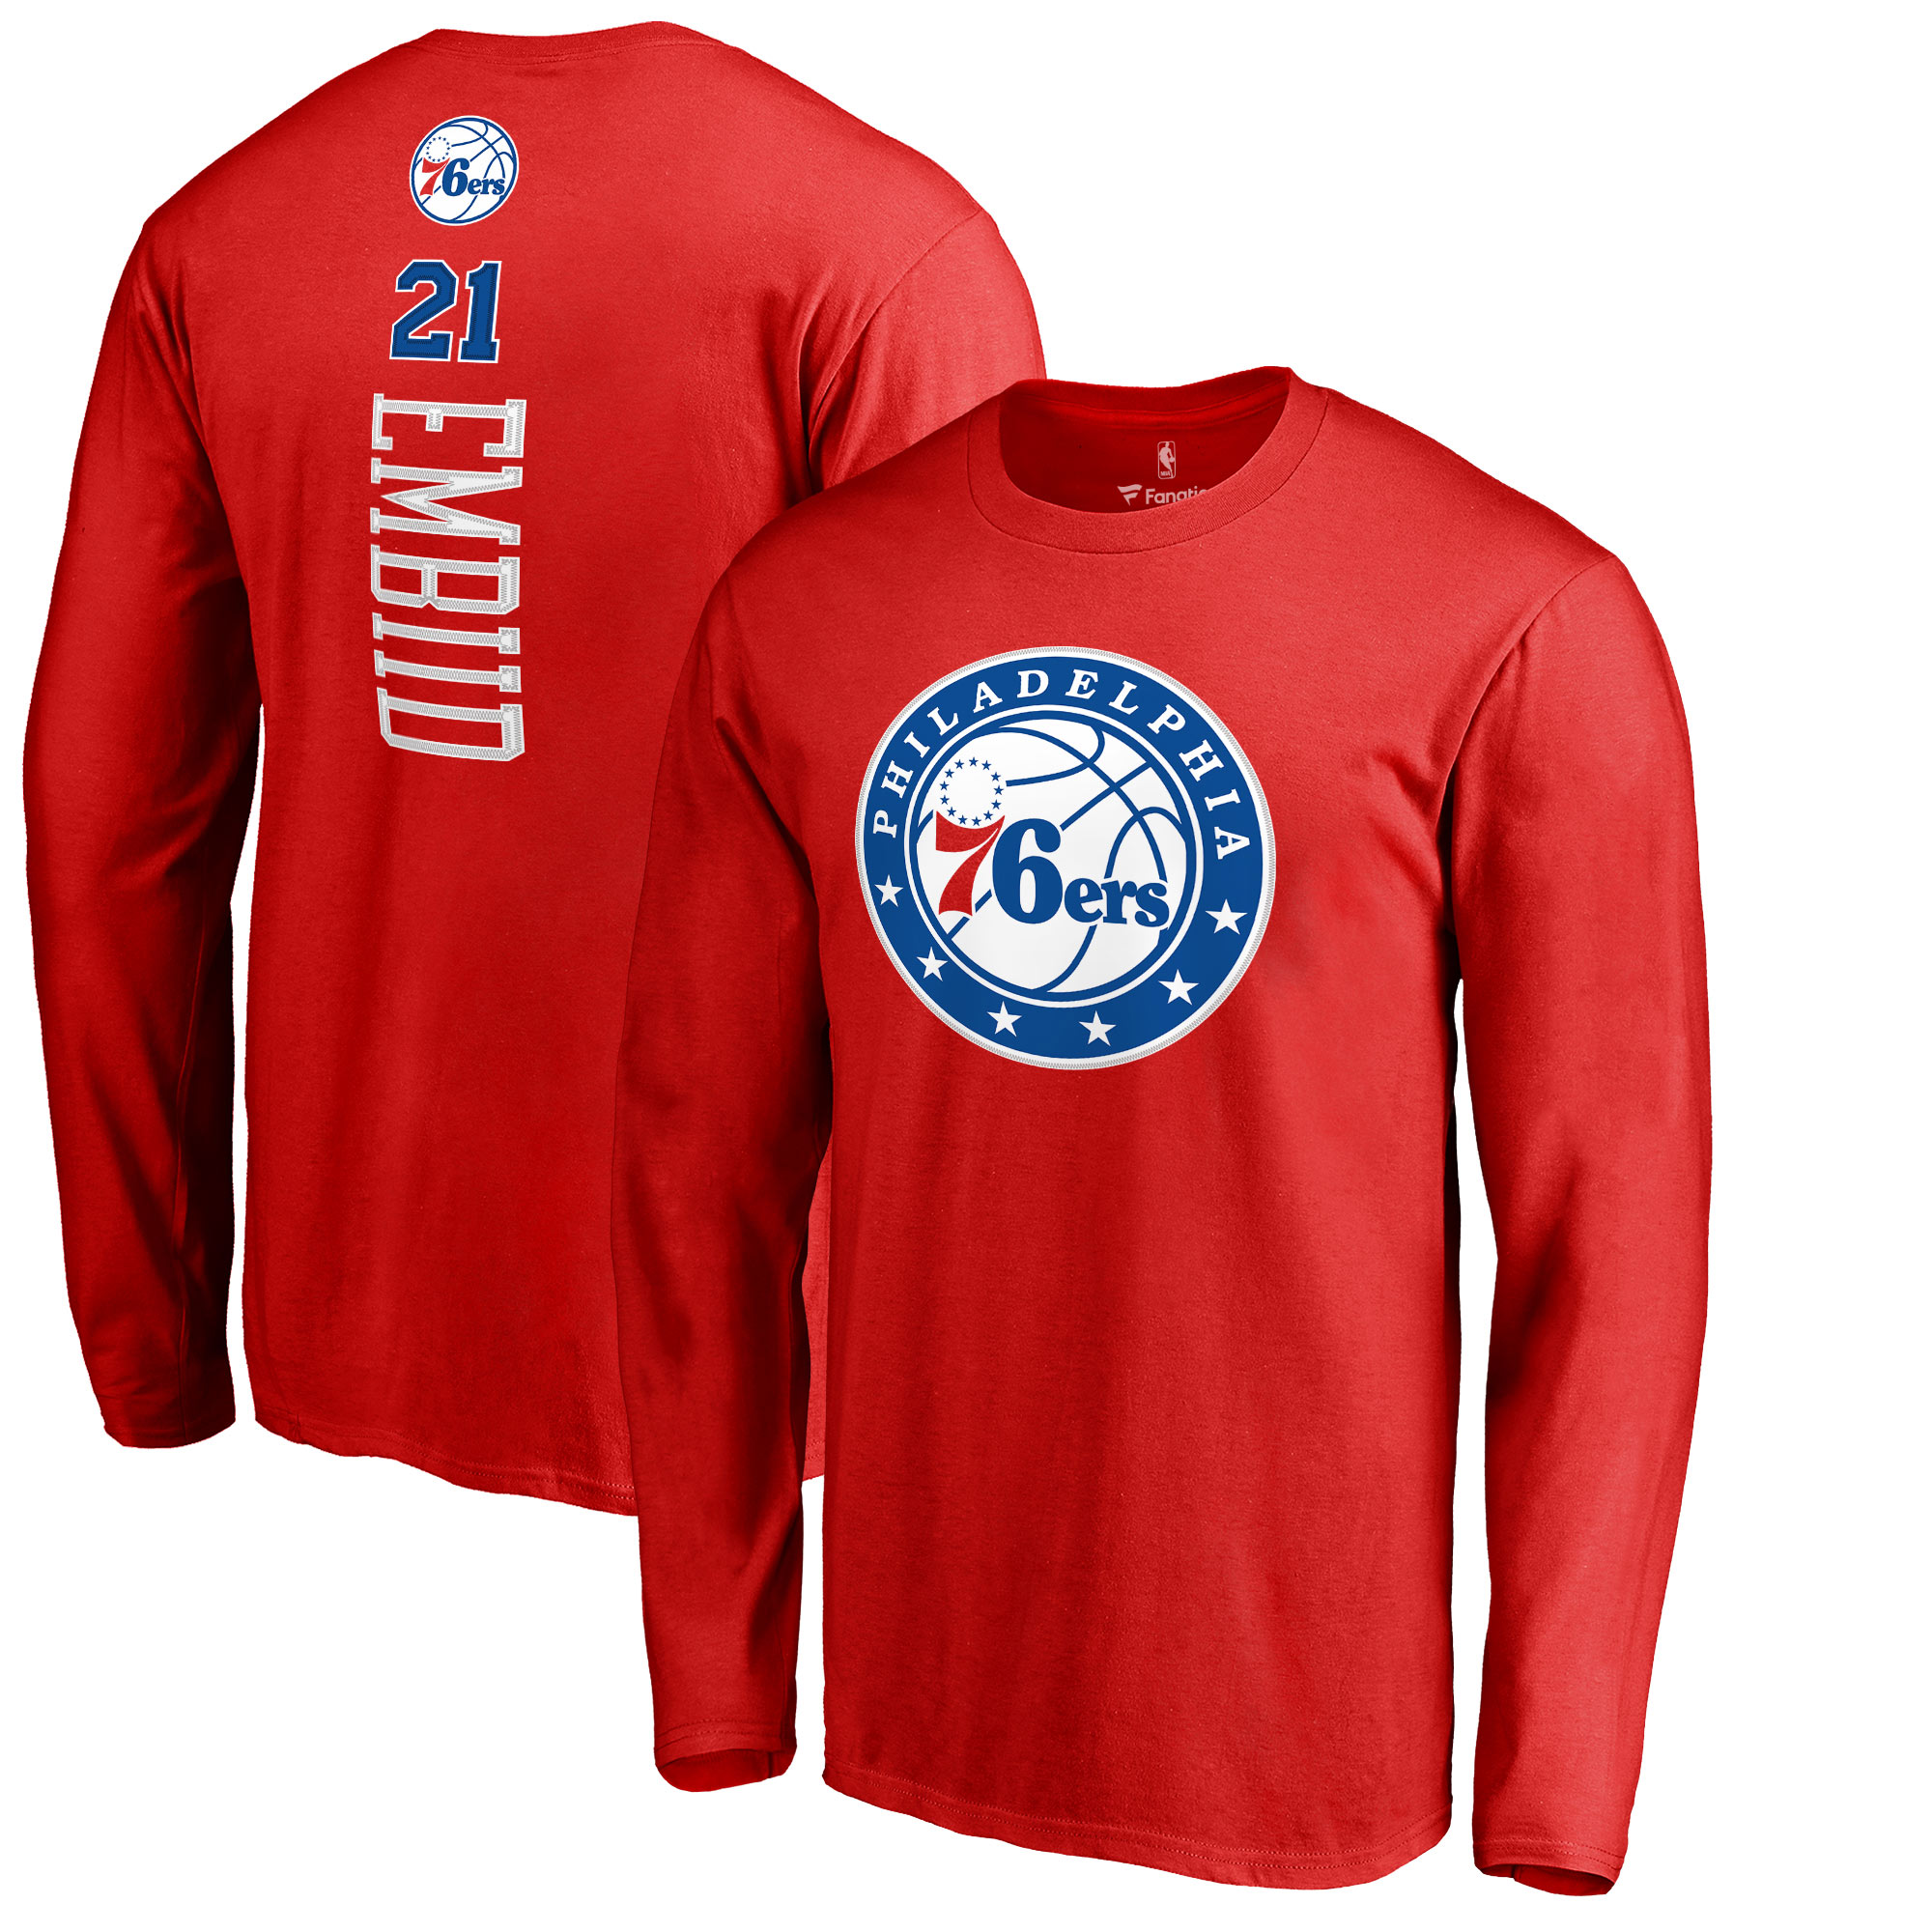 Joel Embiid Philadelphia 76ers Fanatics Branded Backer 3 Name & Number Long Sleeve T-Shirt - Red